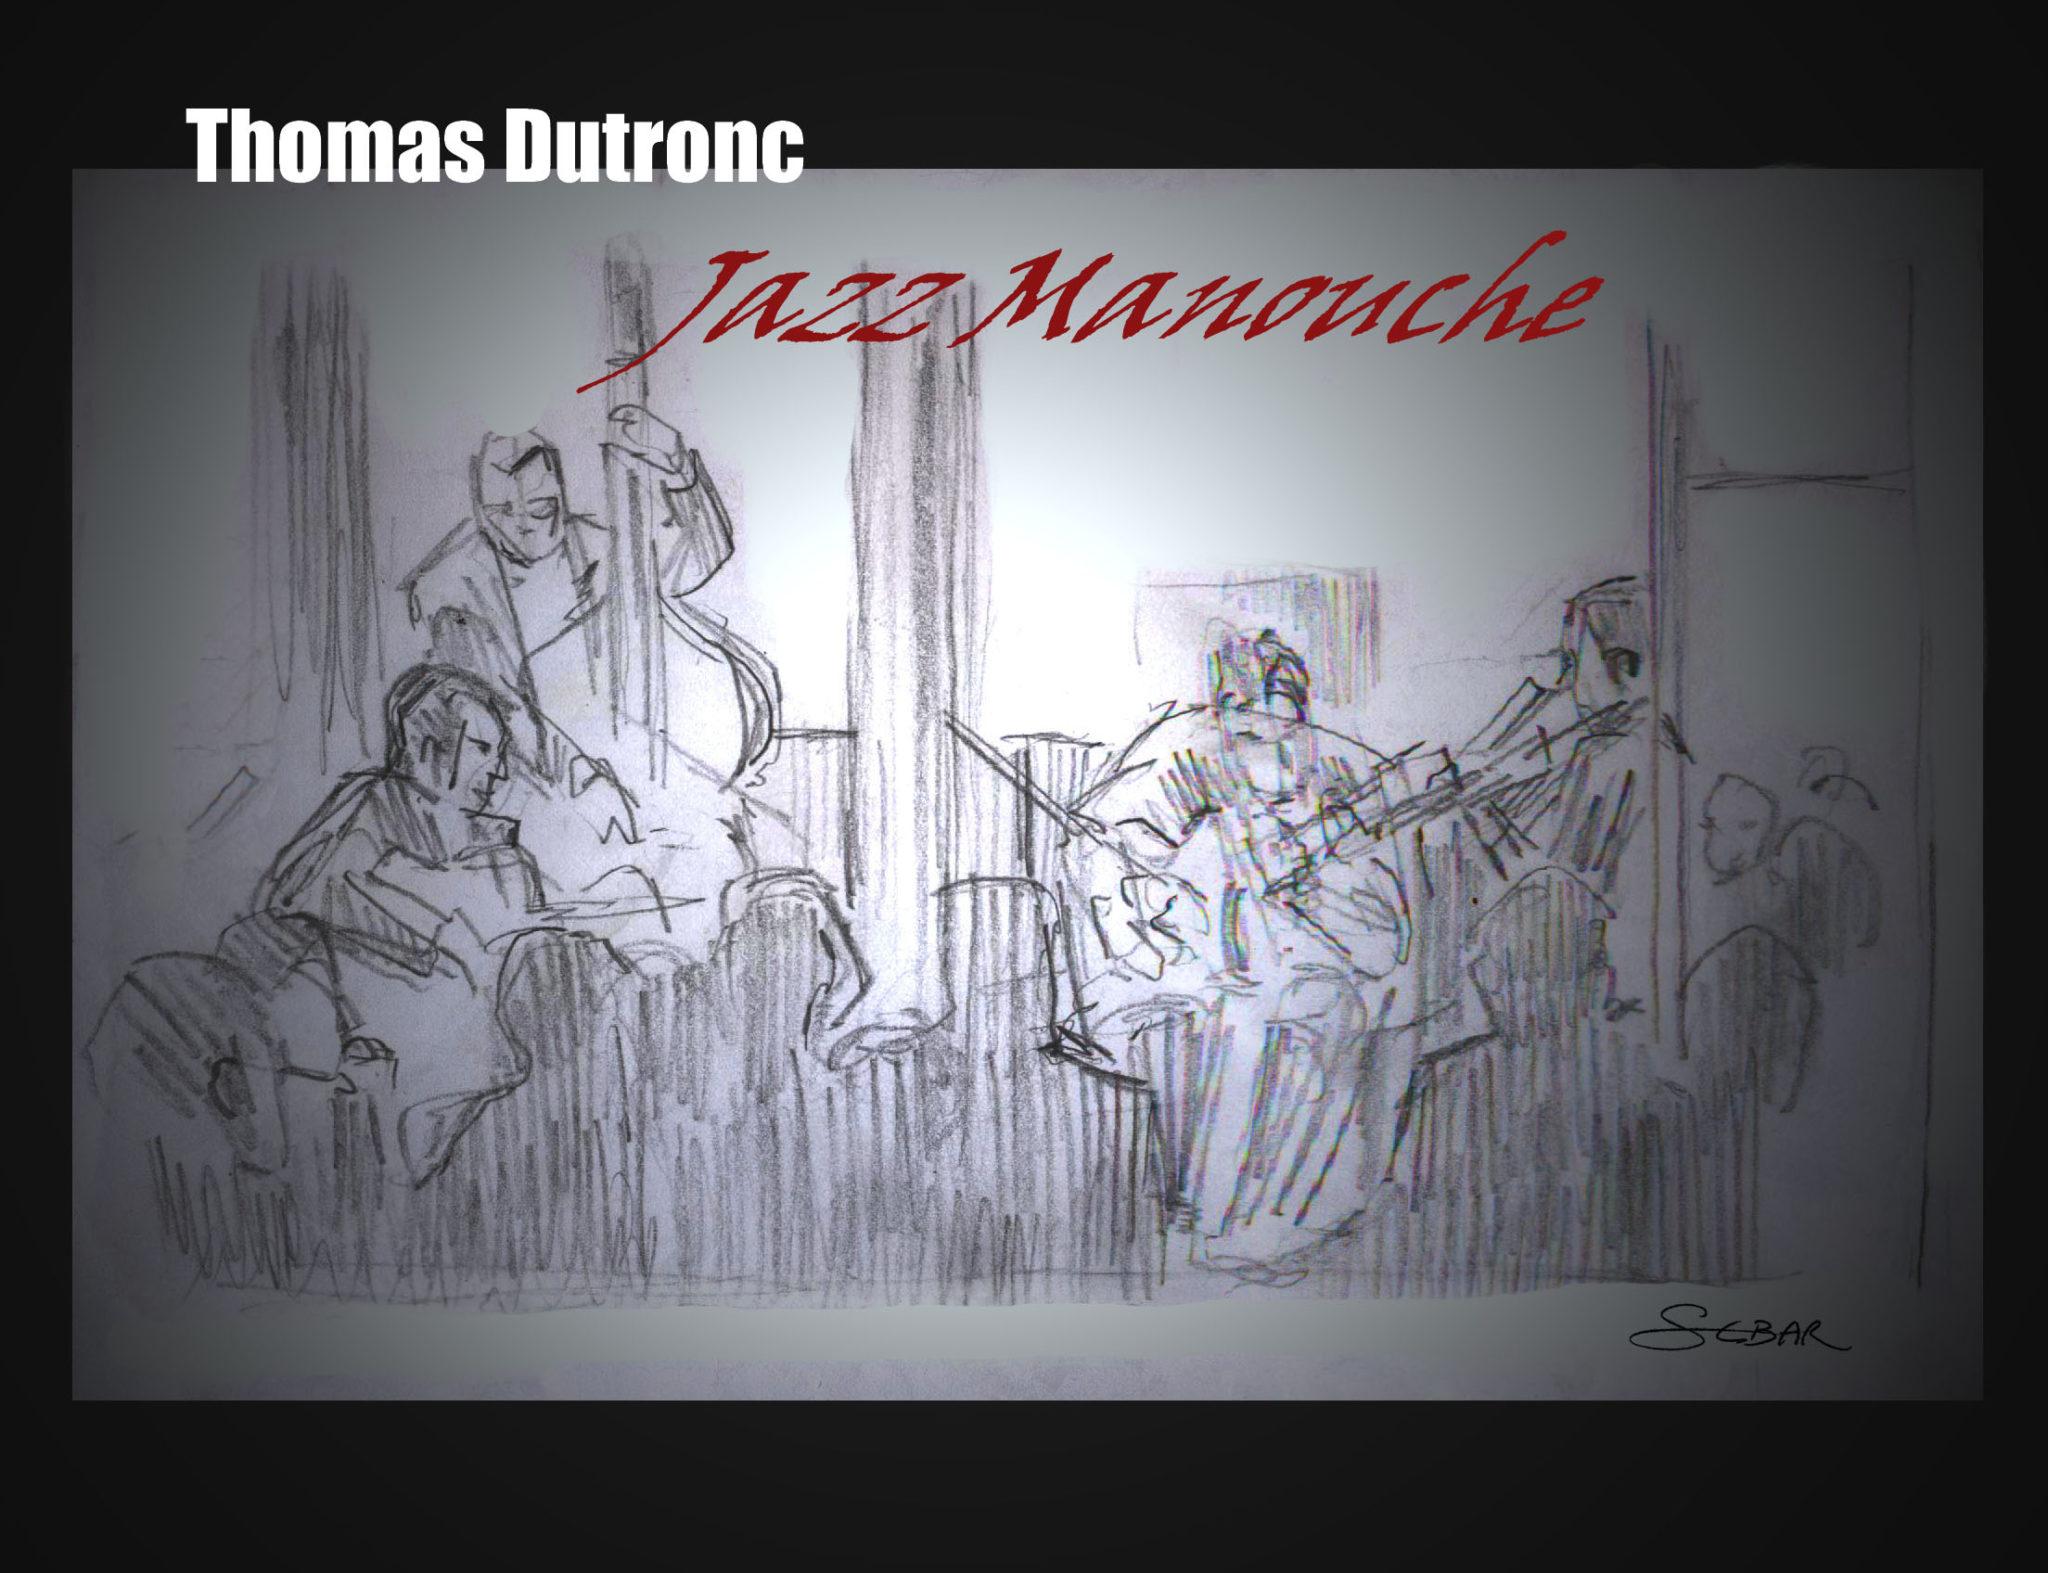 jazz manouche dutronc